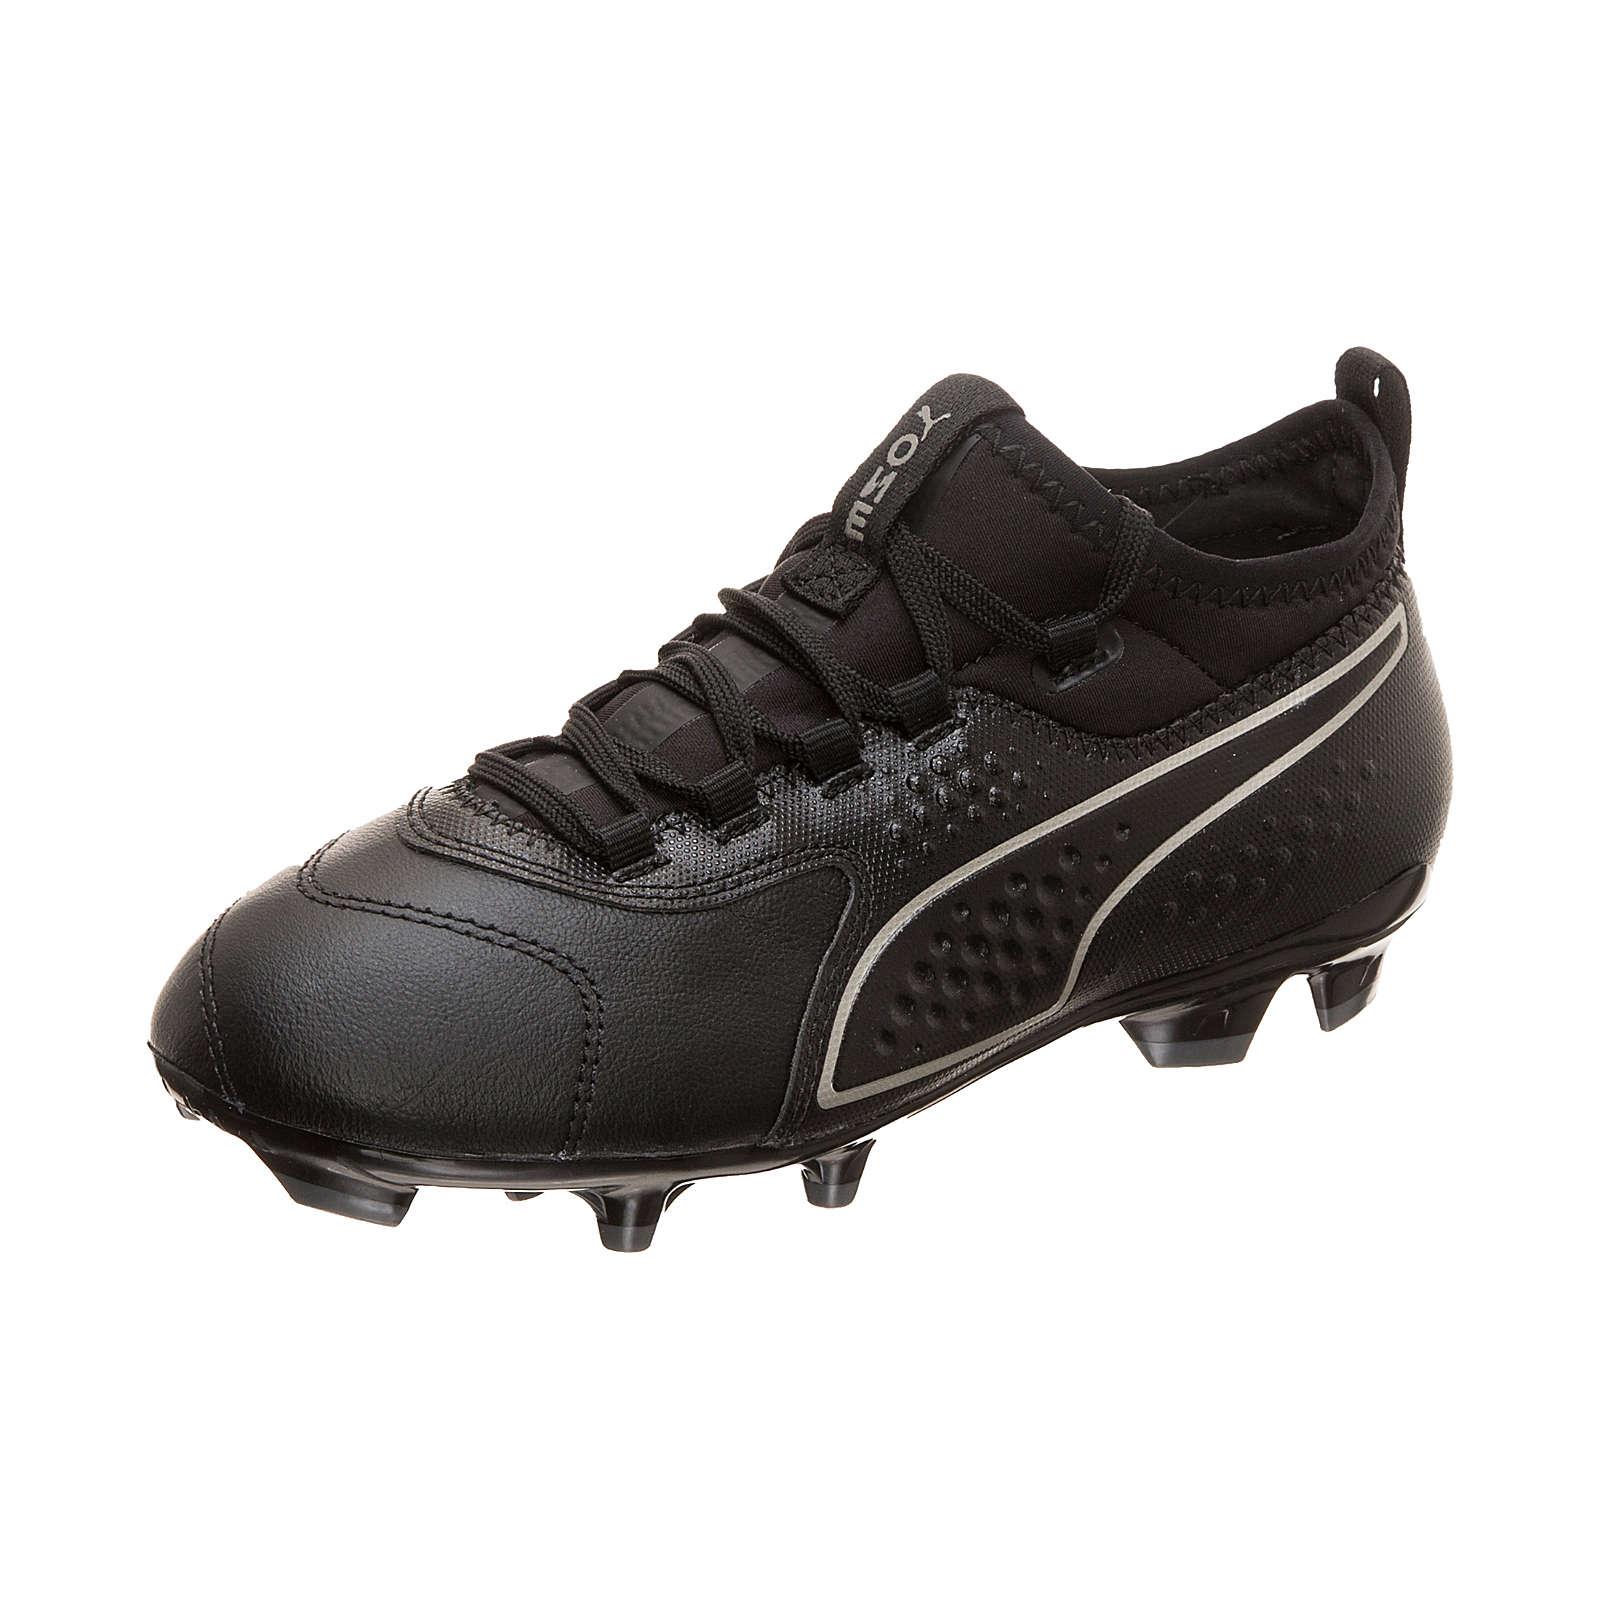 PUMA Kinder Fußballschuhe ONE 3 Leather AG schwarz Gr. 38